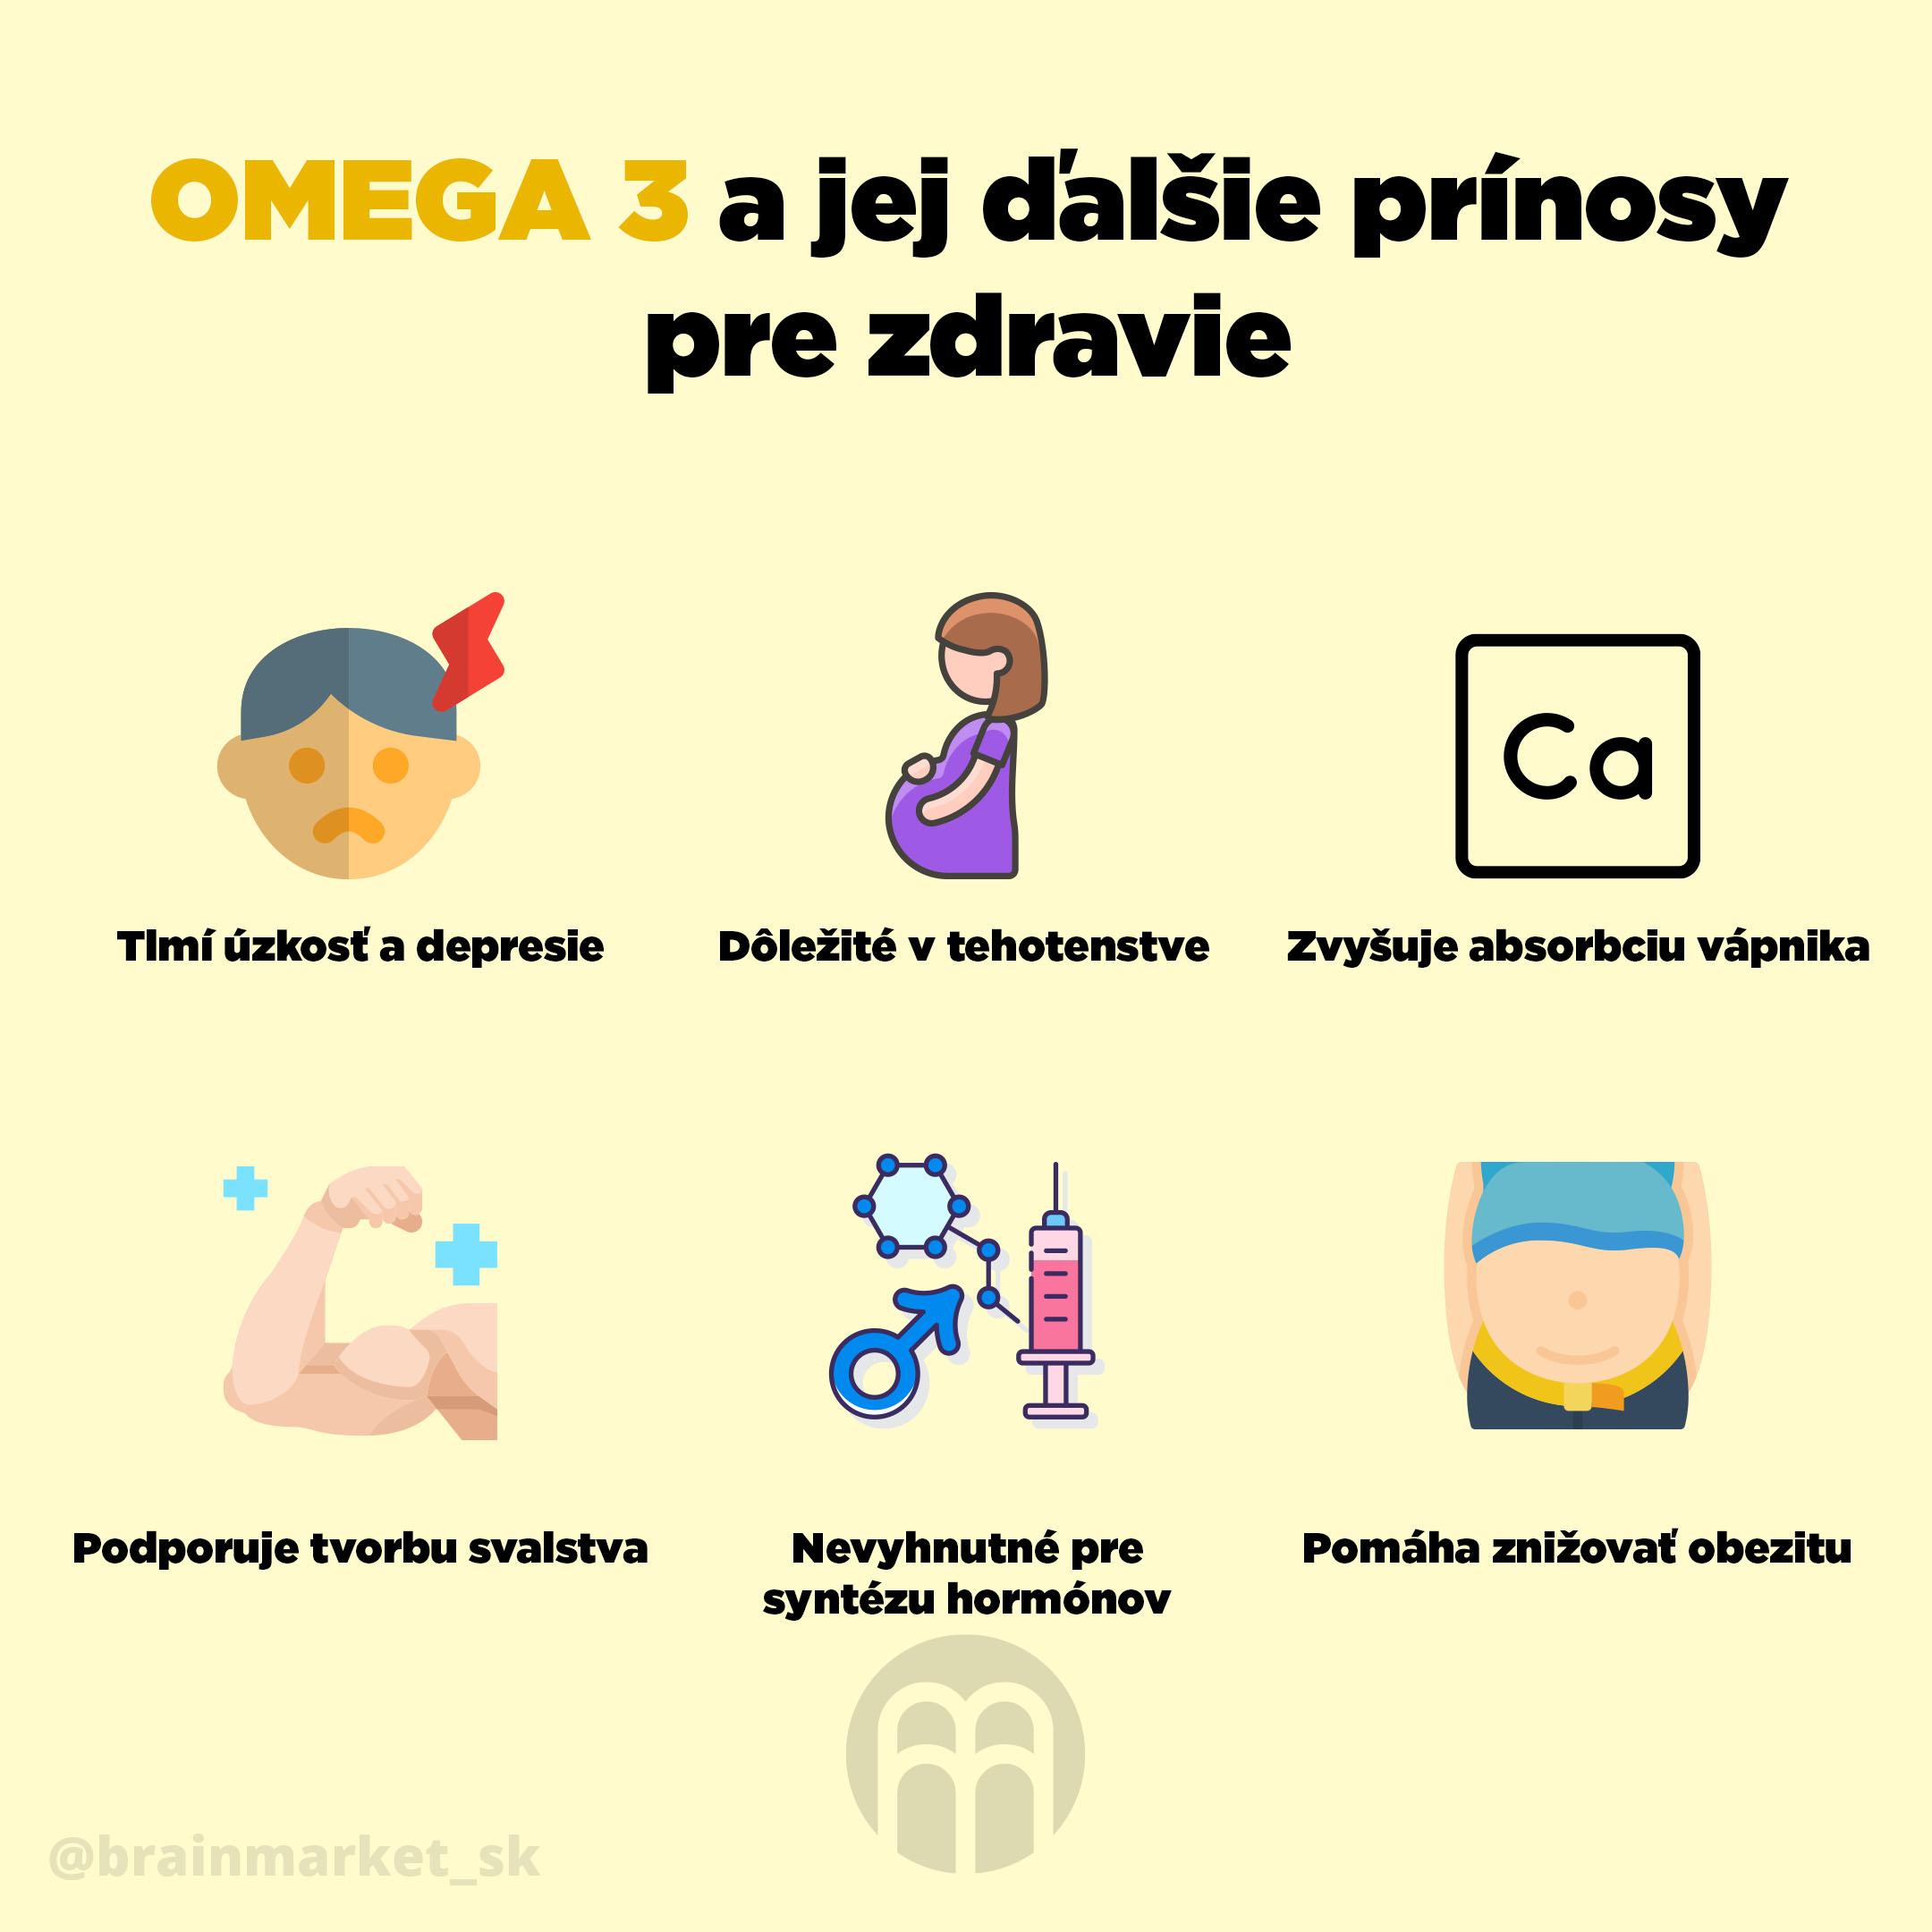 omega_3_a_jej_dalsie_prinosy_pre_zdravie_infografika_brainmarket_SK